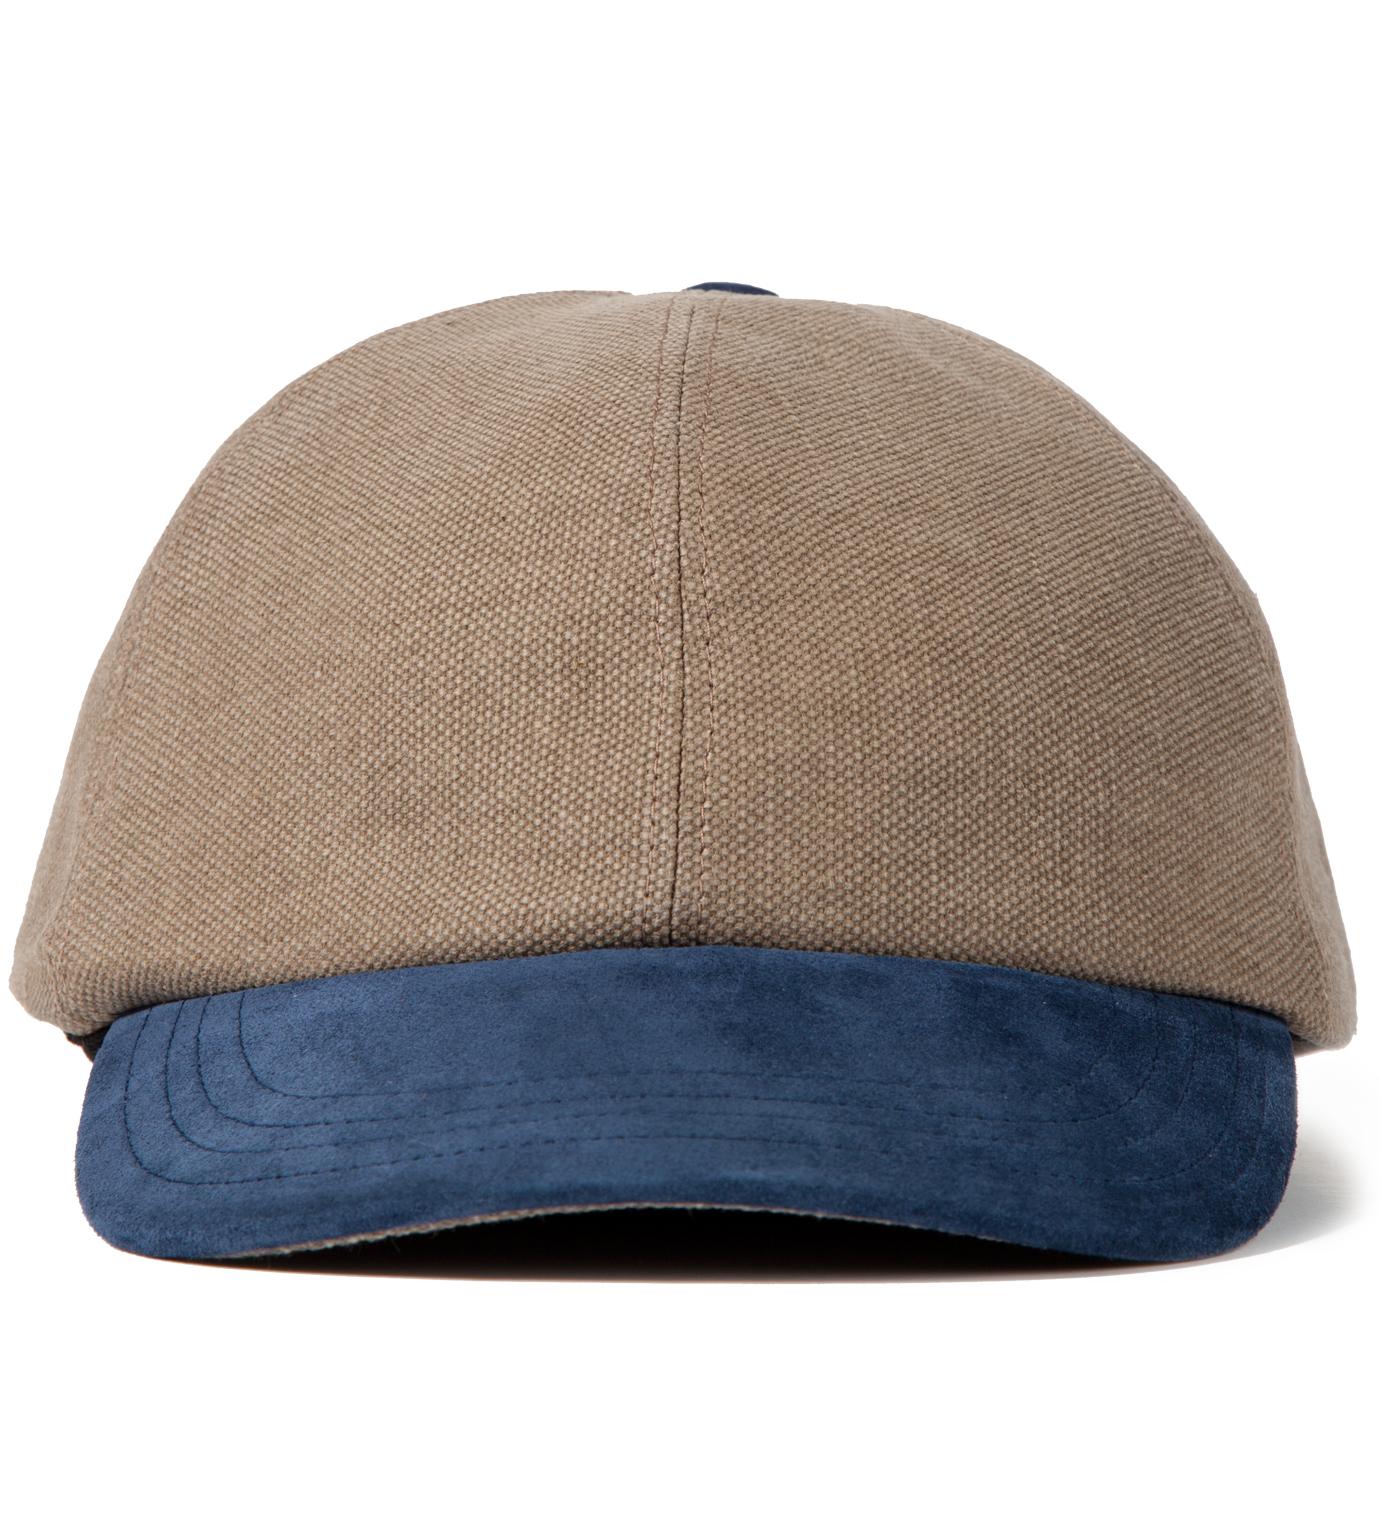 BWGH Grey/Navy Cap